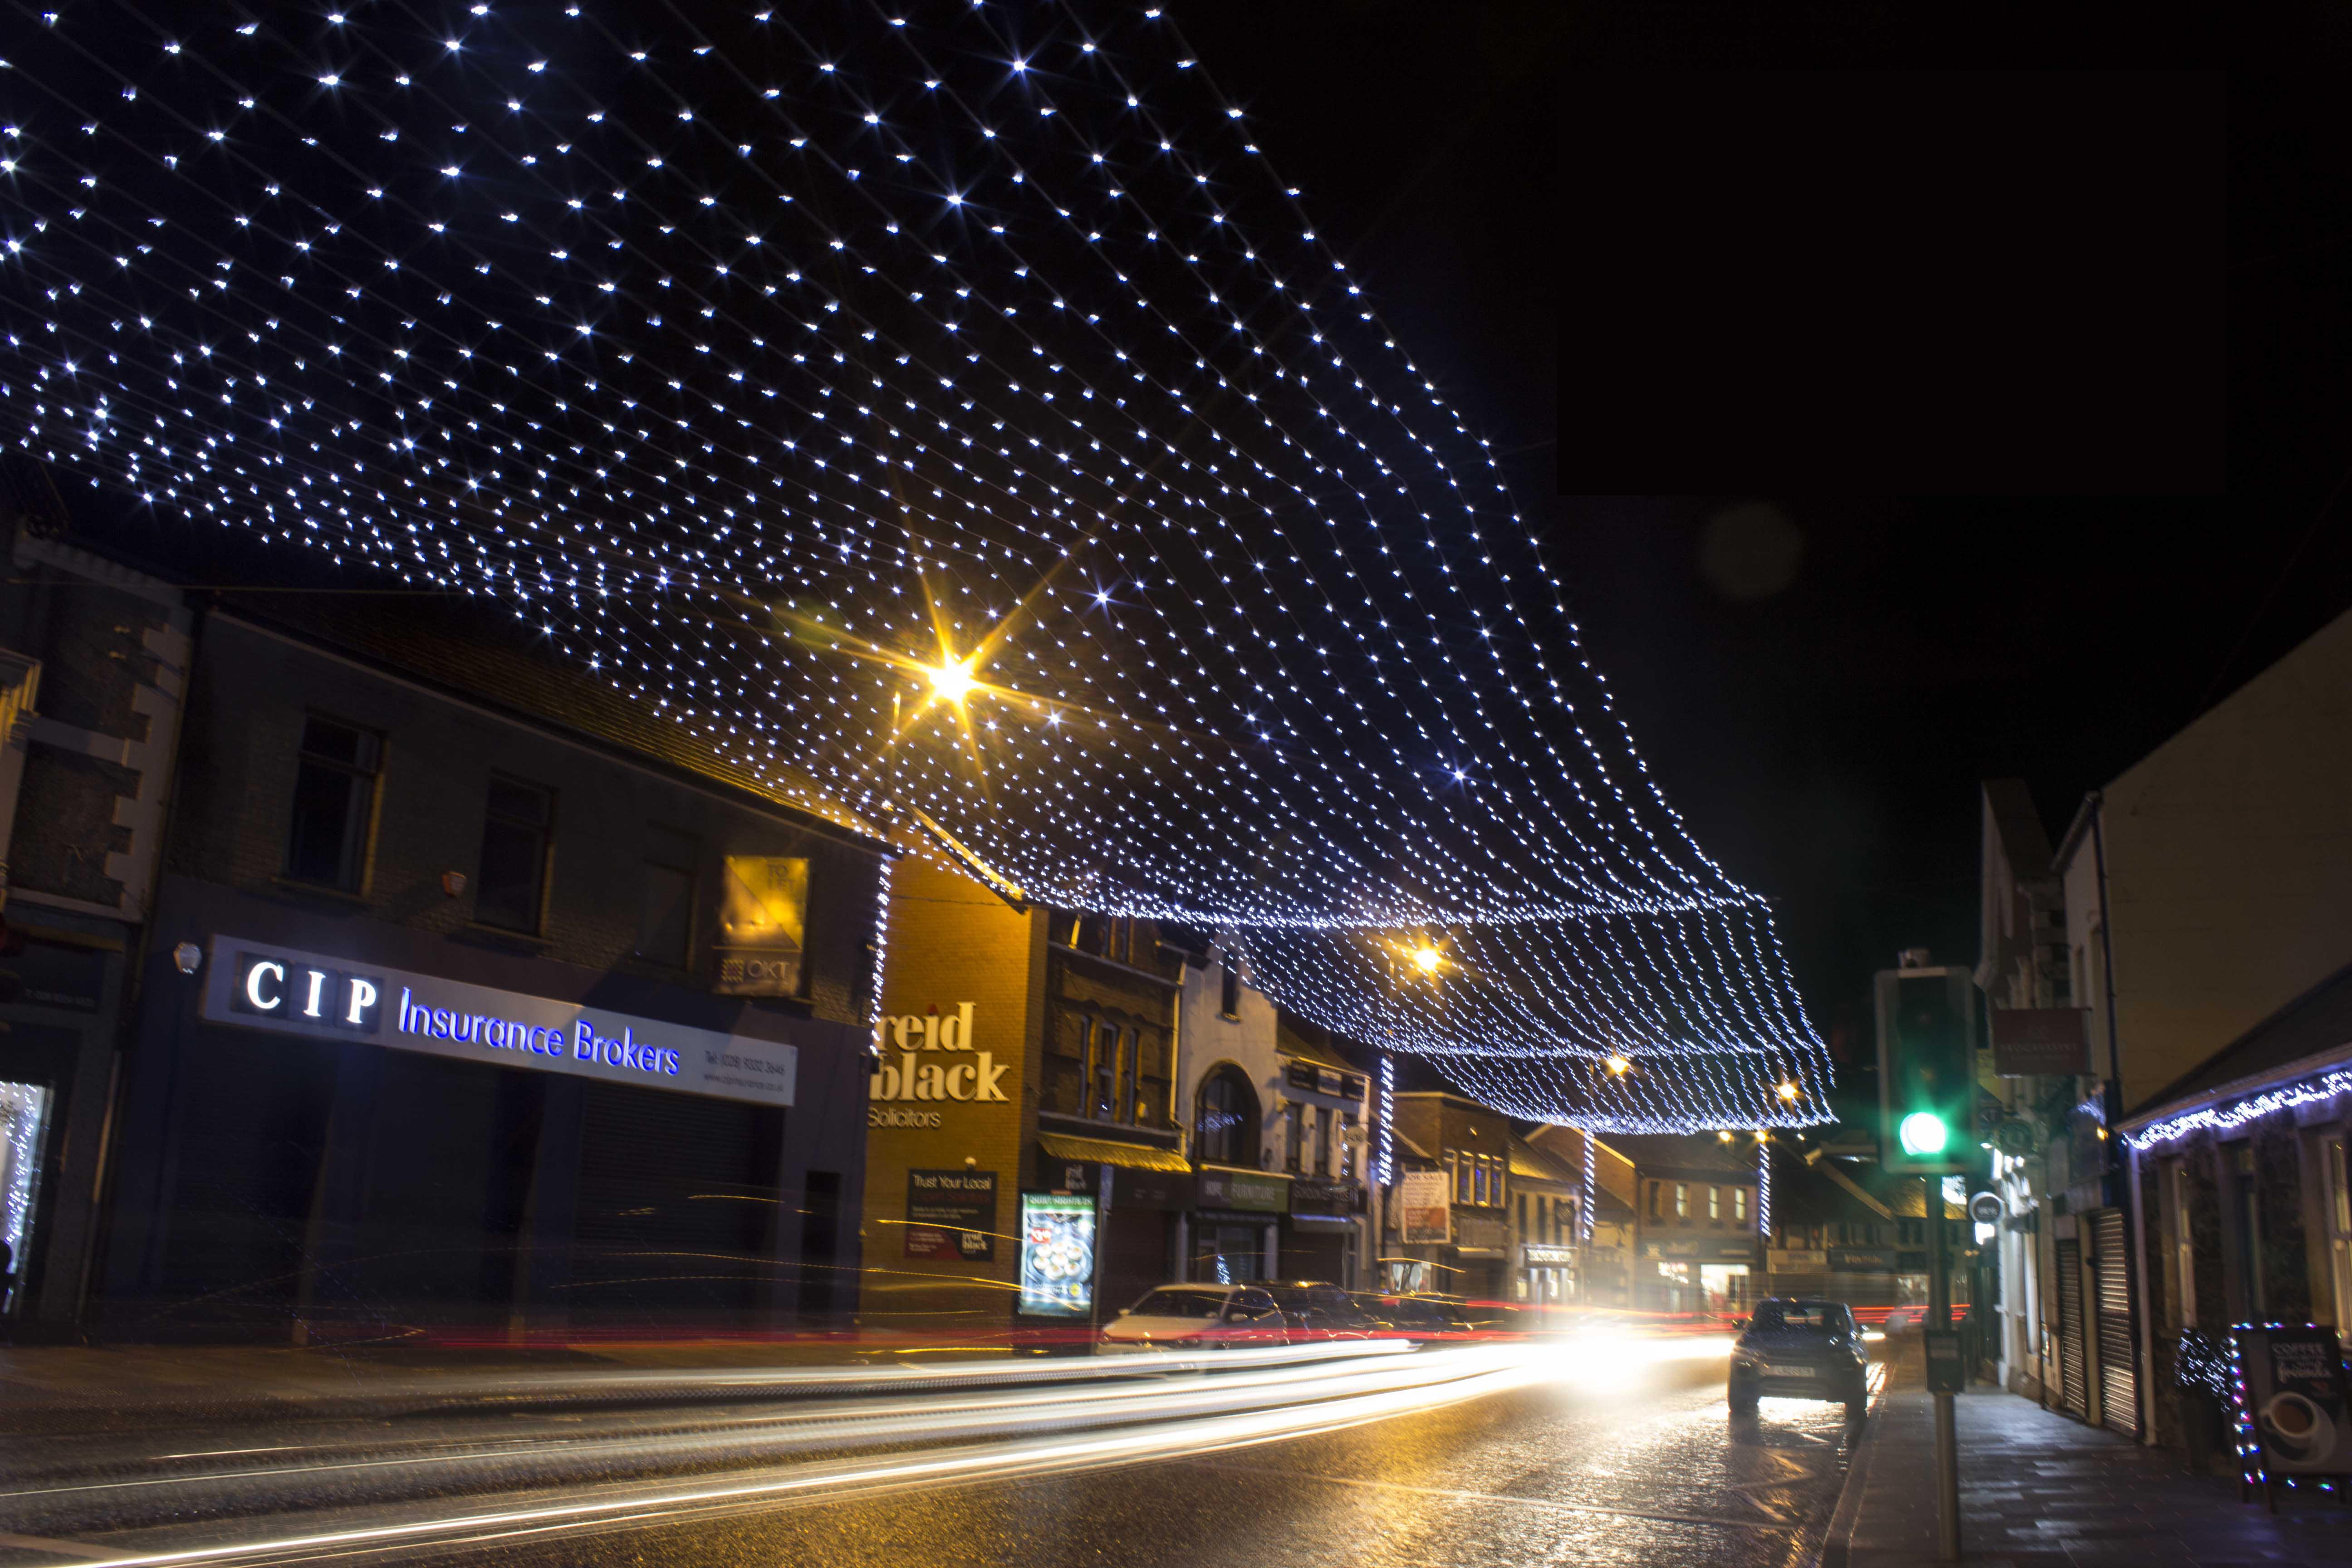 Antrim & Newtownards AJC lluminations